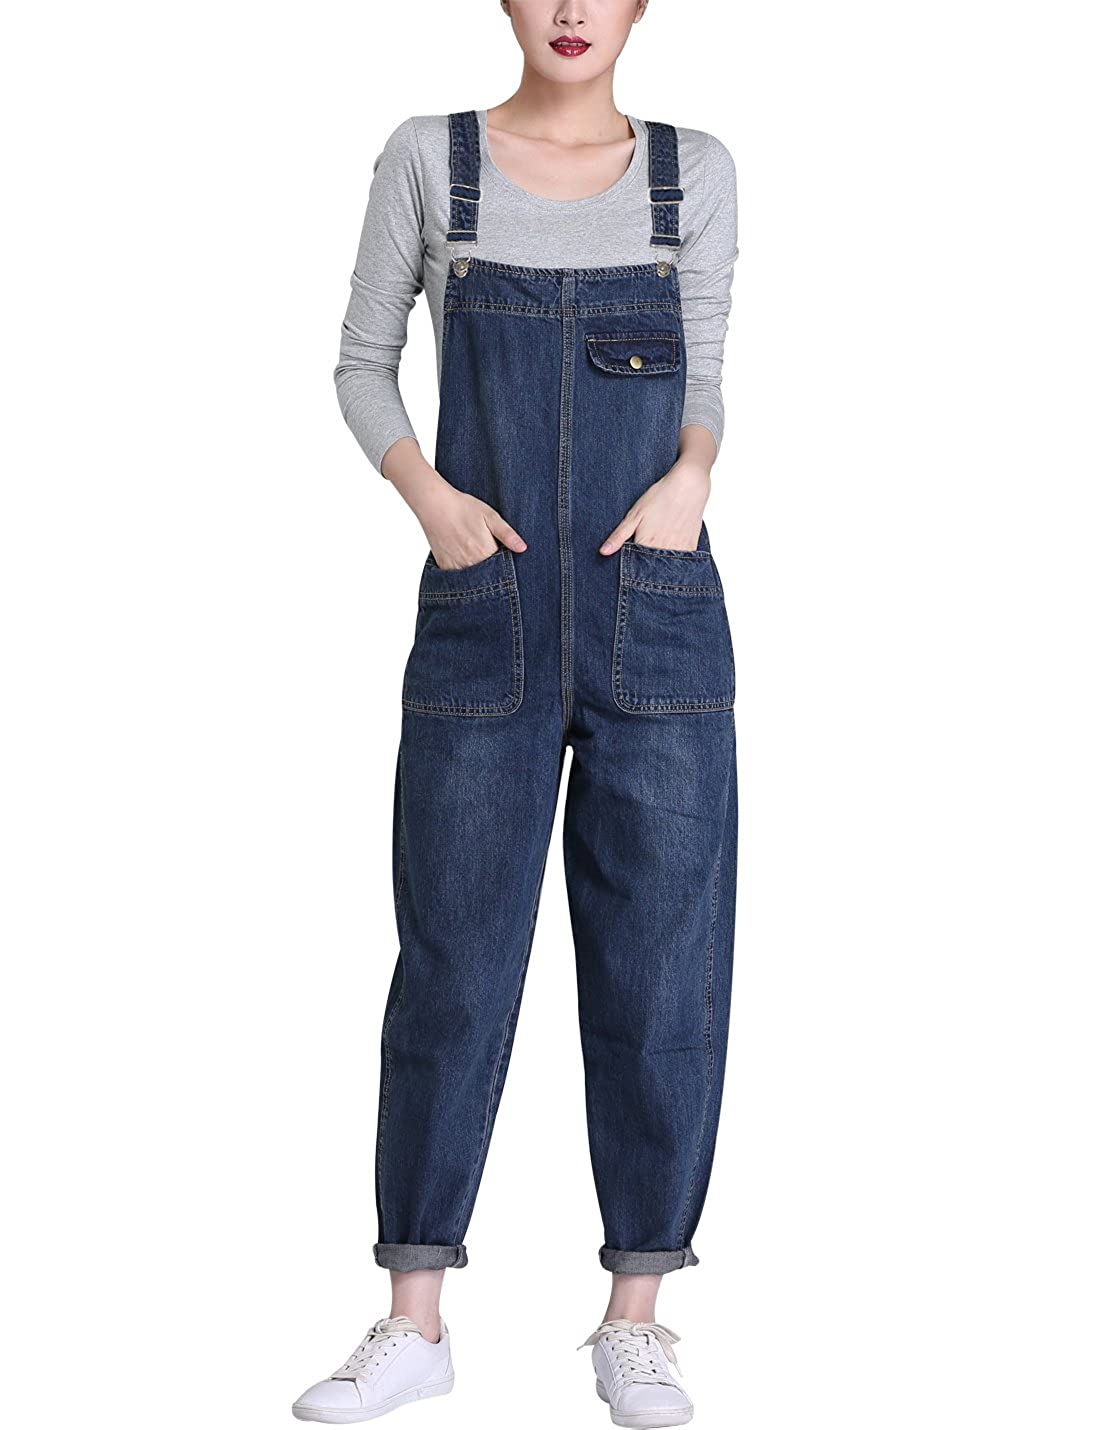 Lentta Womens Loose Baggy Denim Bib Harem Overalls Romper Jumpsuit Pants